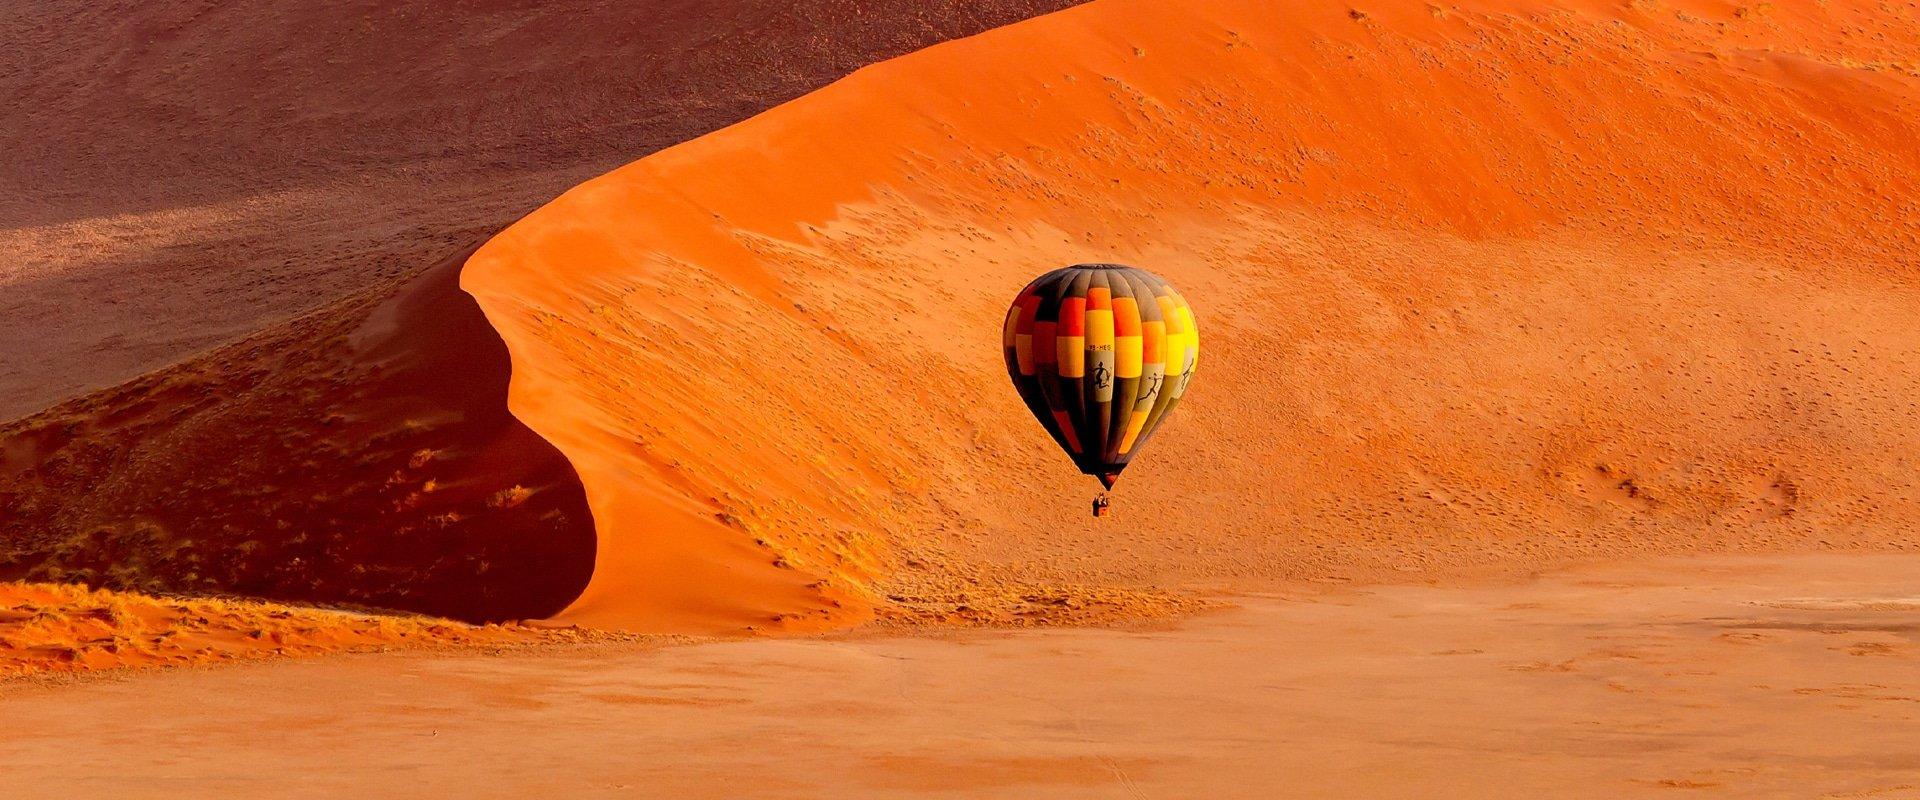 Take a hot-air balloon ride over Sossusvlei